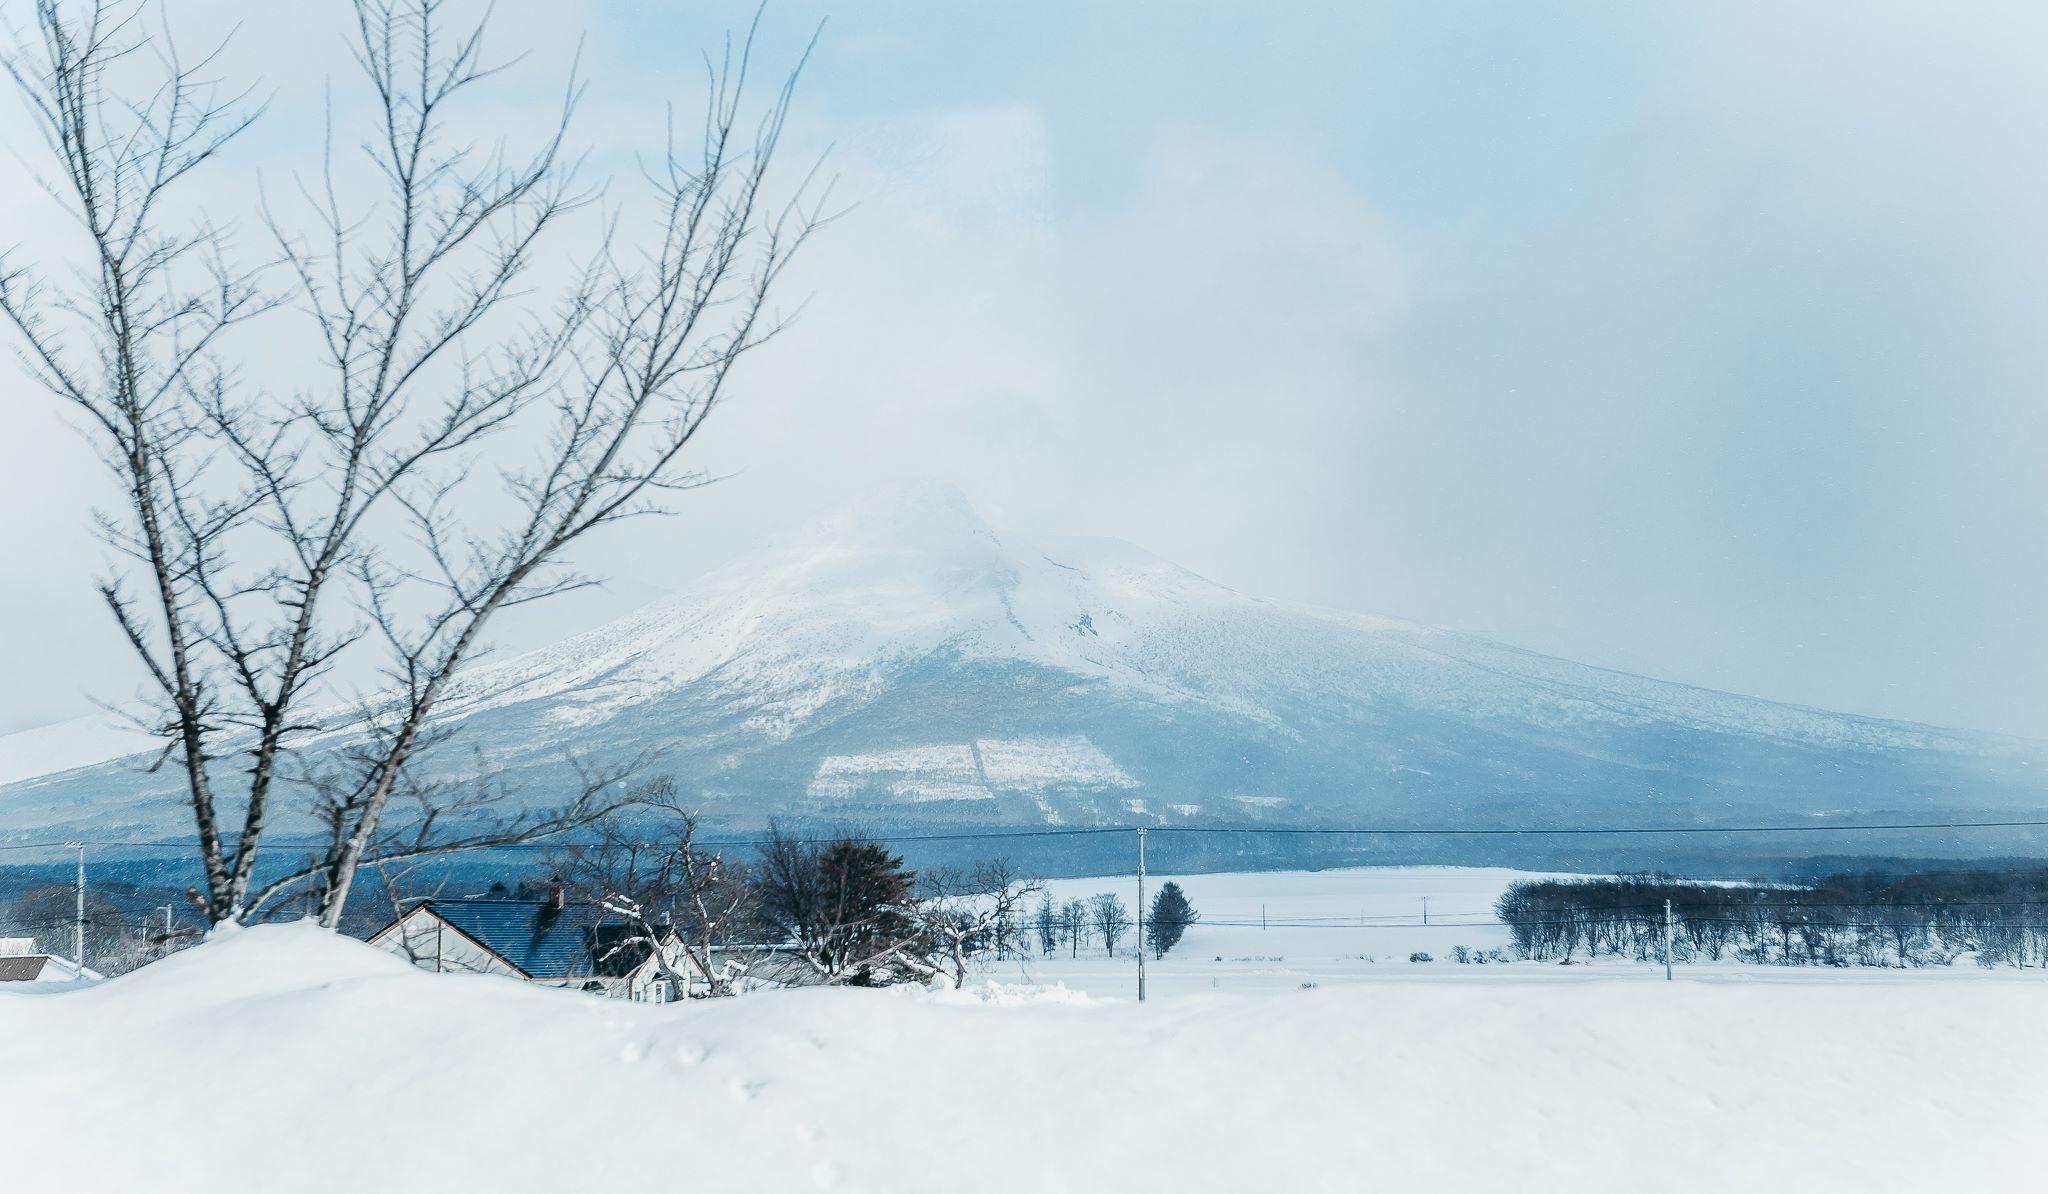 Hokkaido tuyet trang, noi dang den nhat mua dong o Nhat Ban hinh anh 6